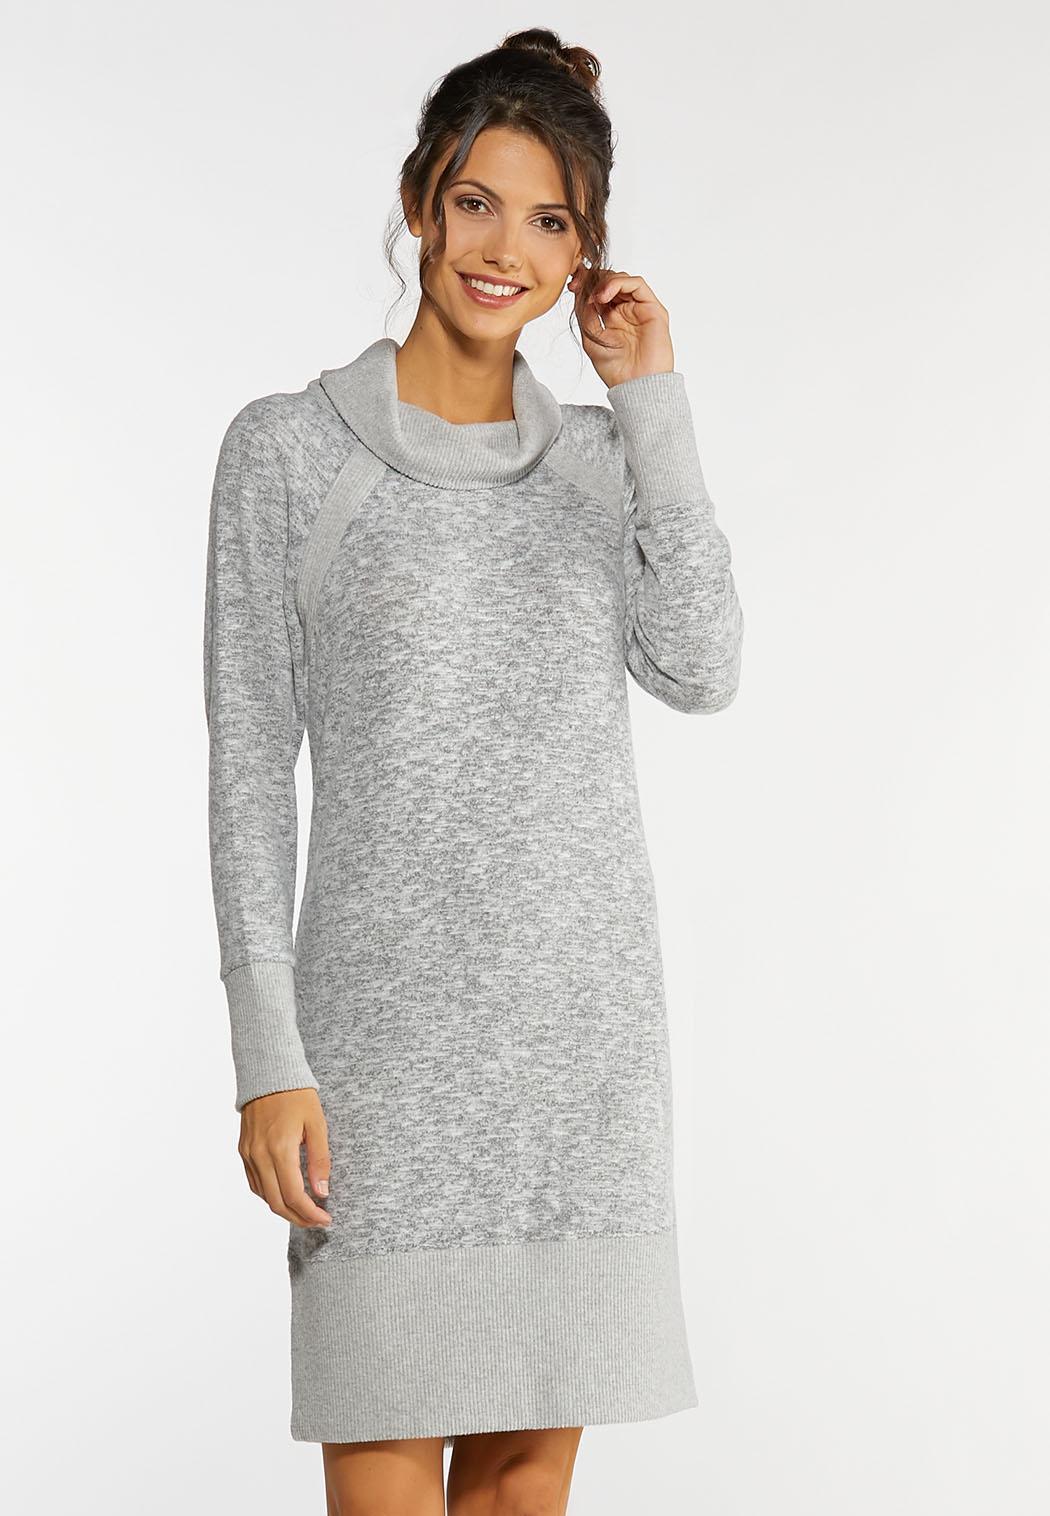 Plus Size Cowl Neck Active Dress Athleisure Cato Fashions